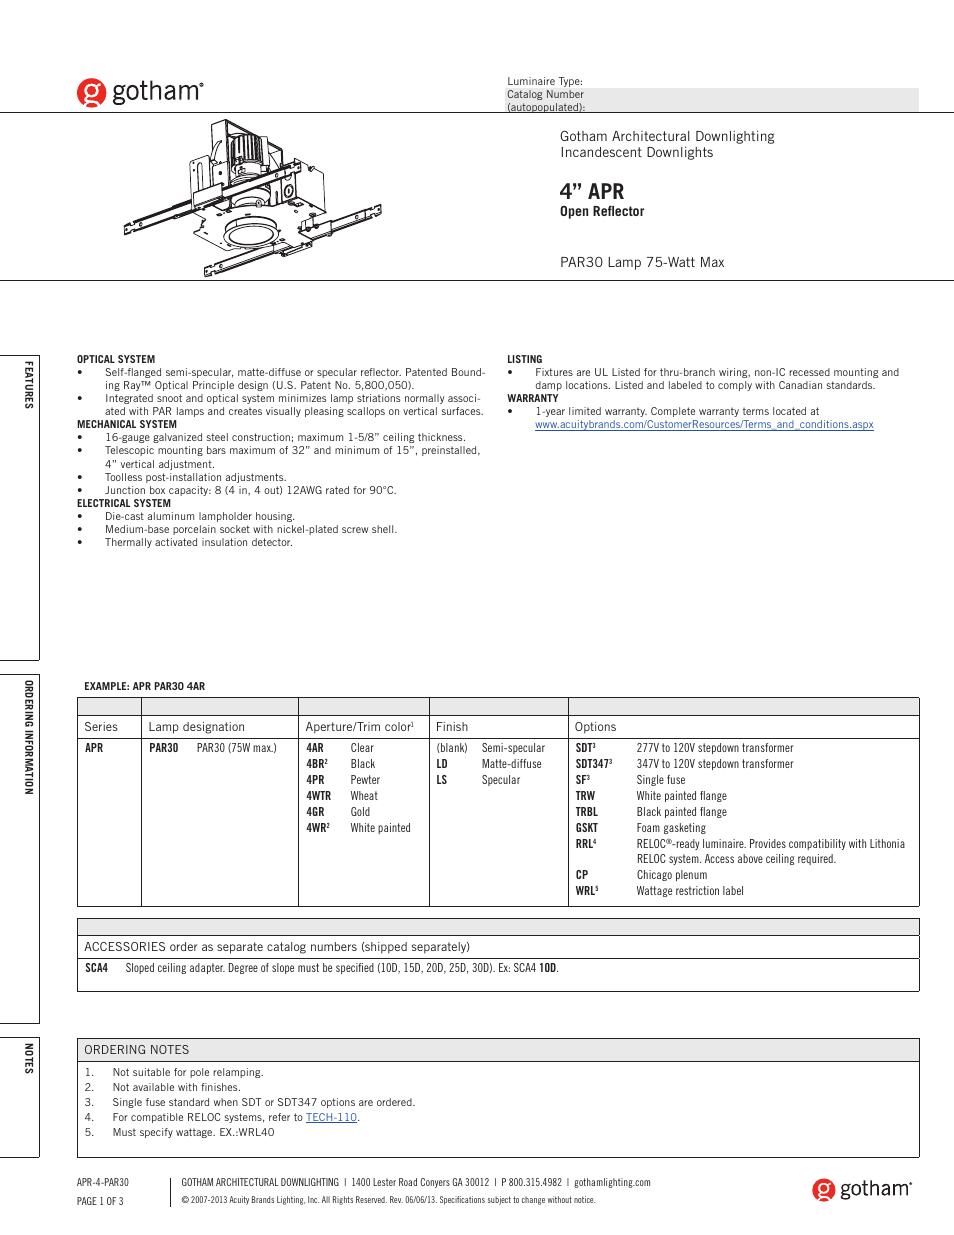 Wiring Diagram Power Sentry Ps300 - 4k Wallpapers Design